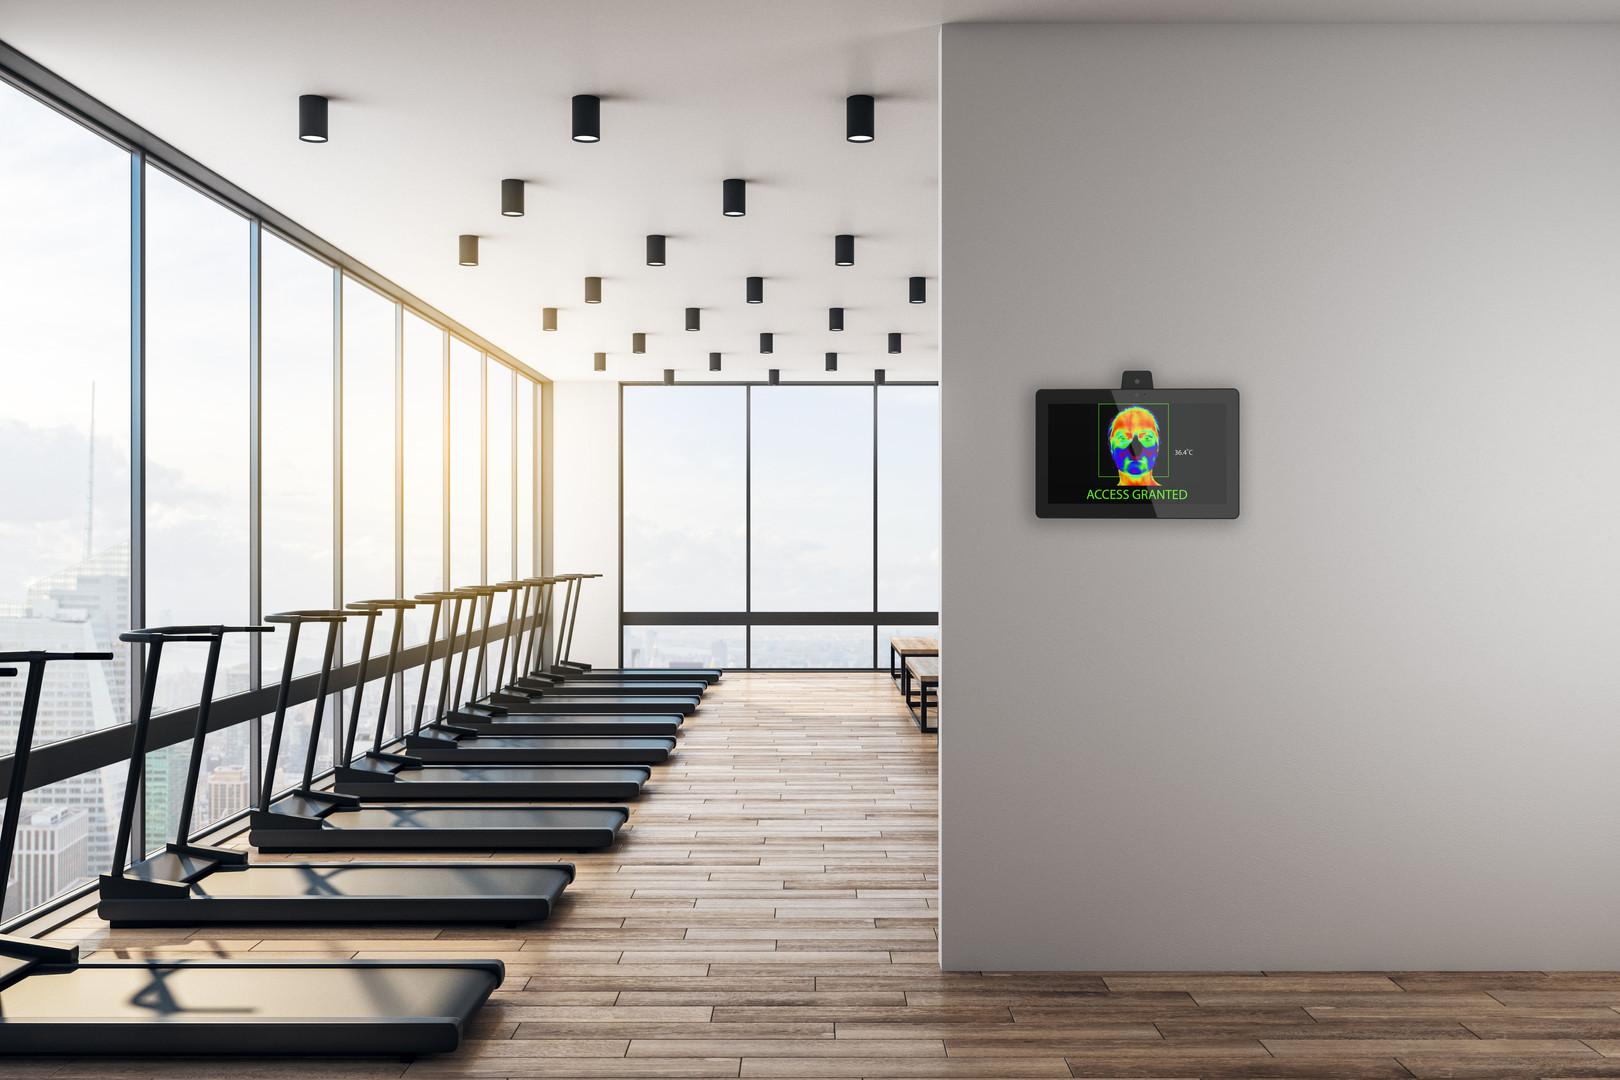 corona temperature check tablet gym.jpg